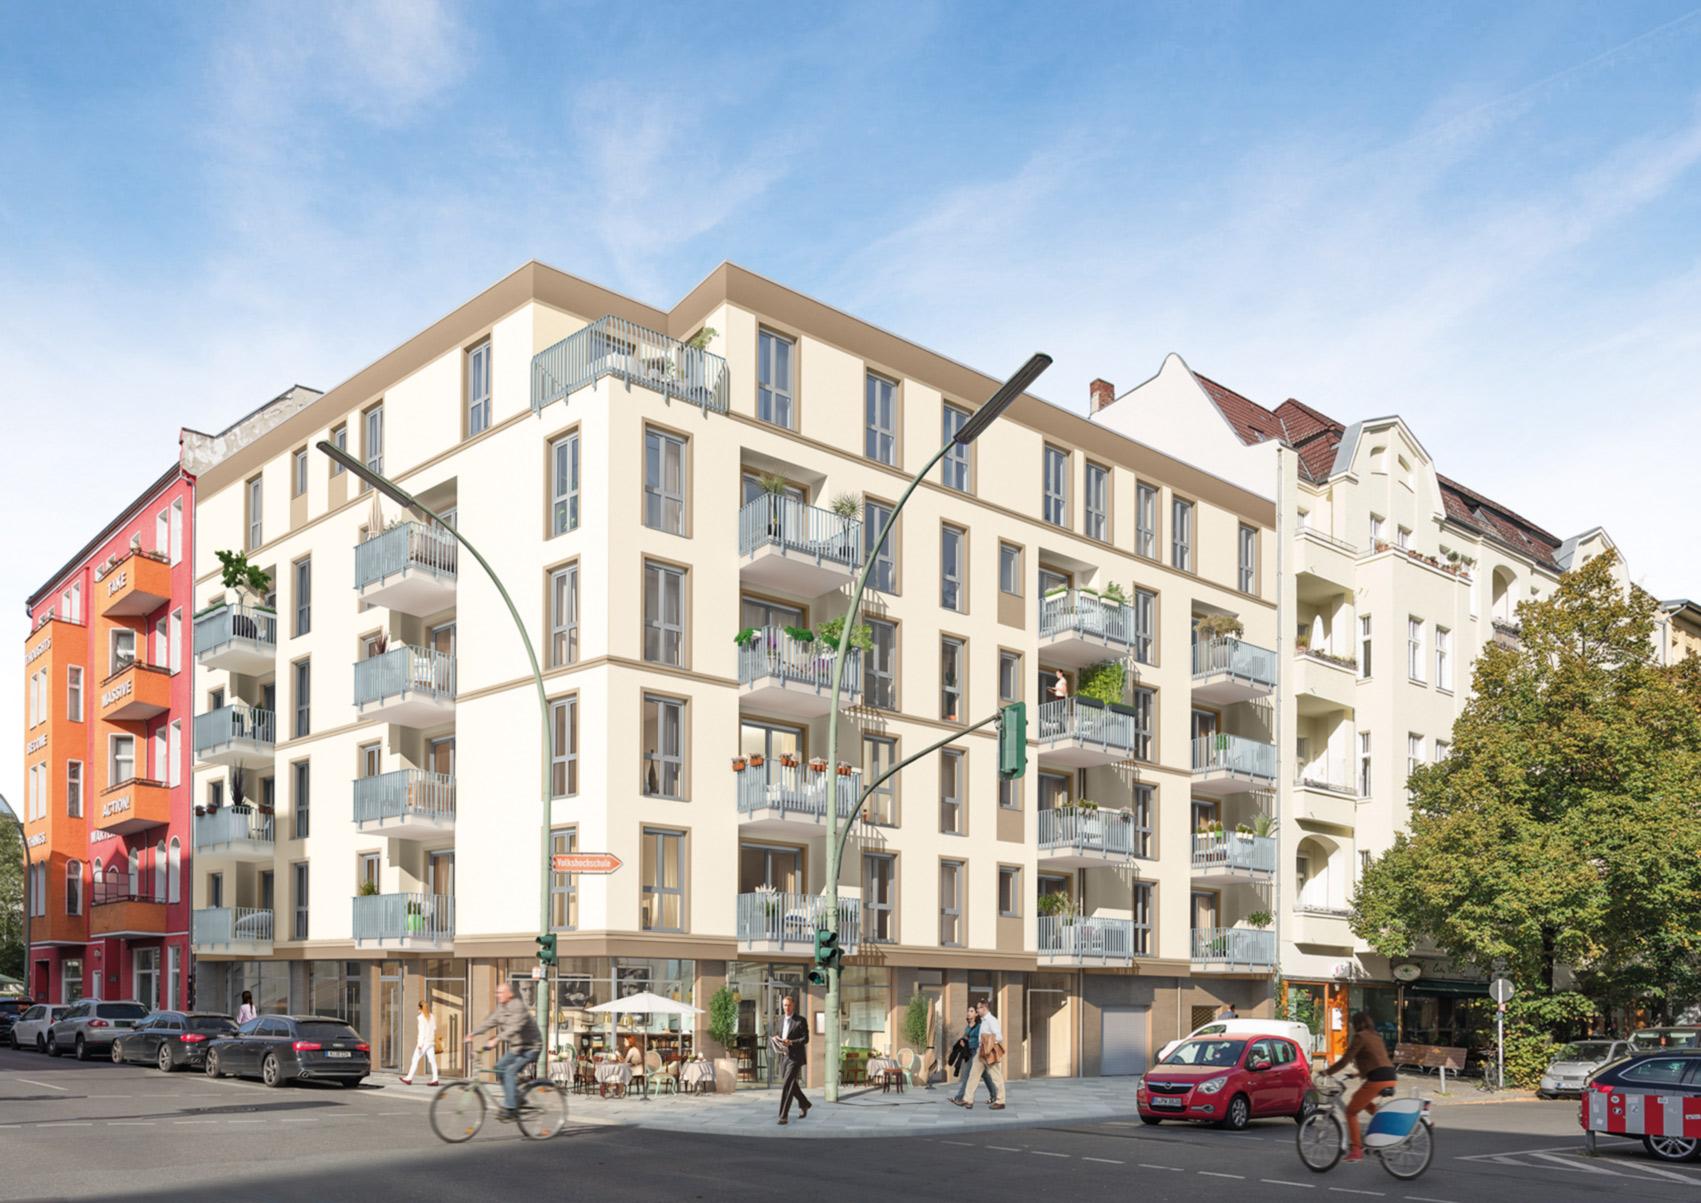 palais 41 gehobene city wohnungen in berlin sch neberg. Black Bedroom Furniture Sets. Home Design Ideas